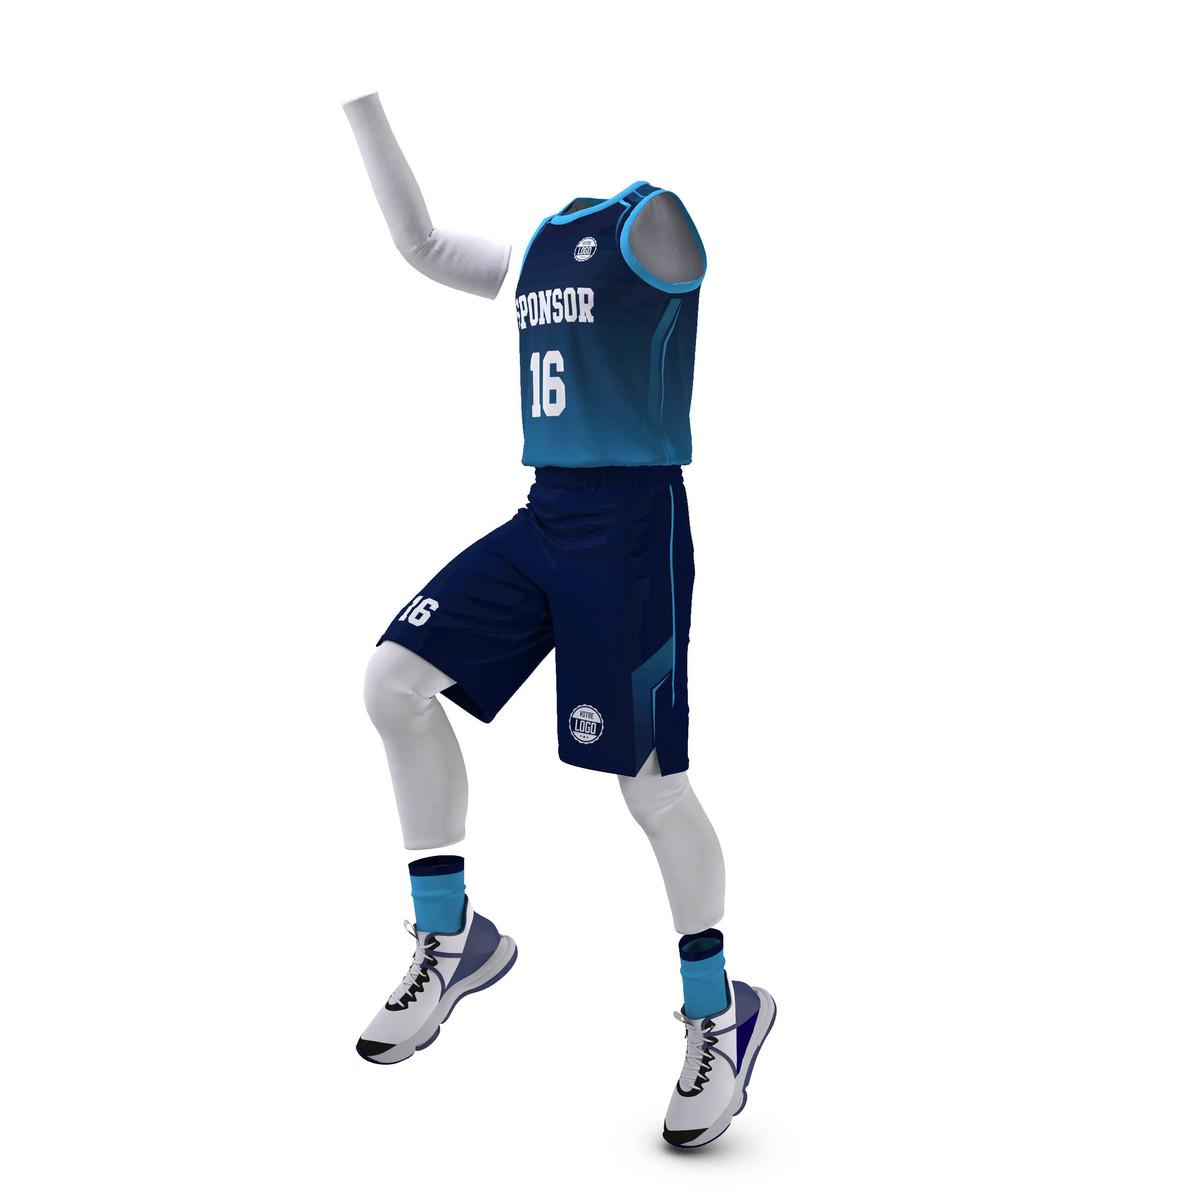 Image_basketball-01-set5-v2--0-0--2b653614-3cb4-4a2d-a587-979ec166fe0a